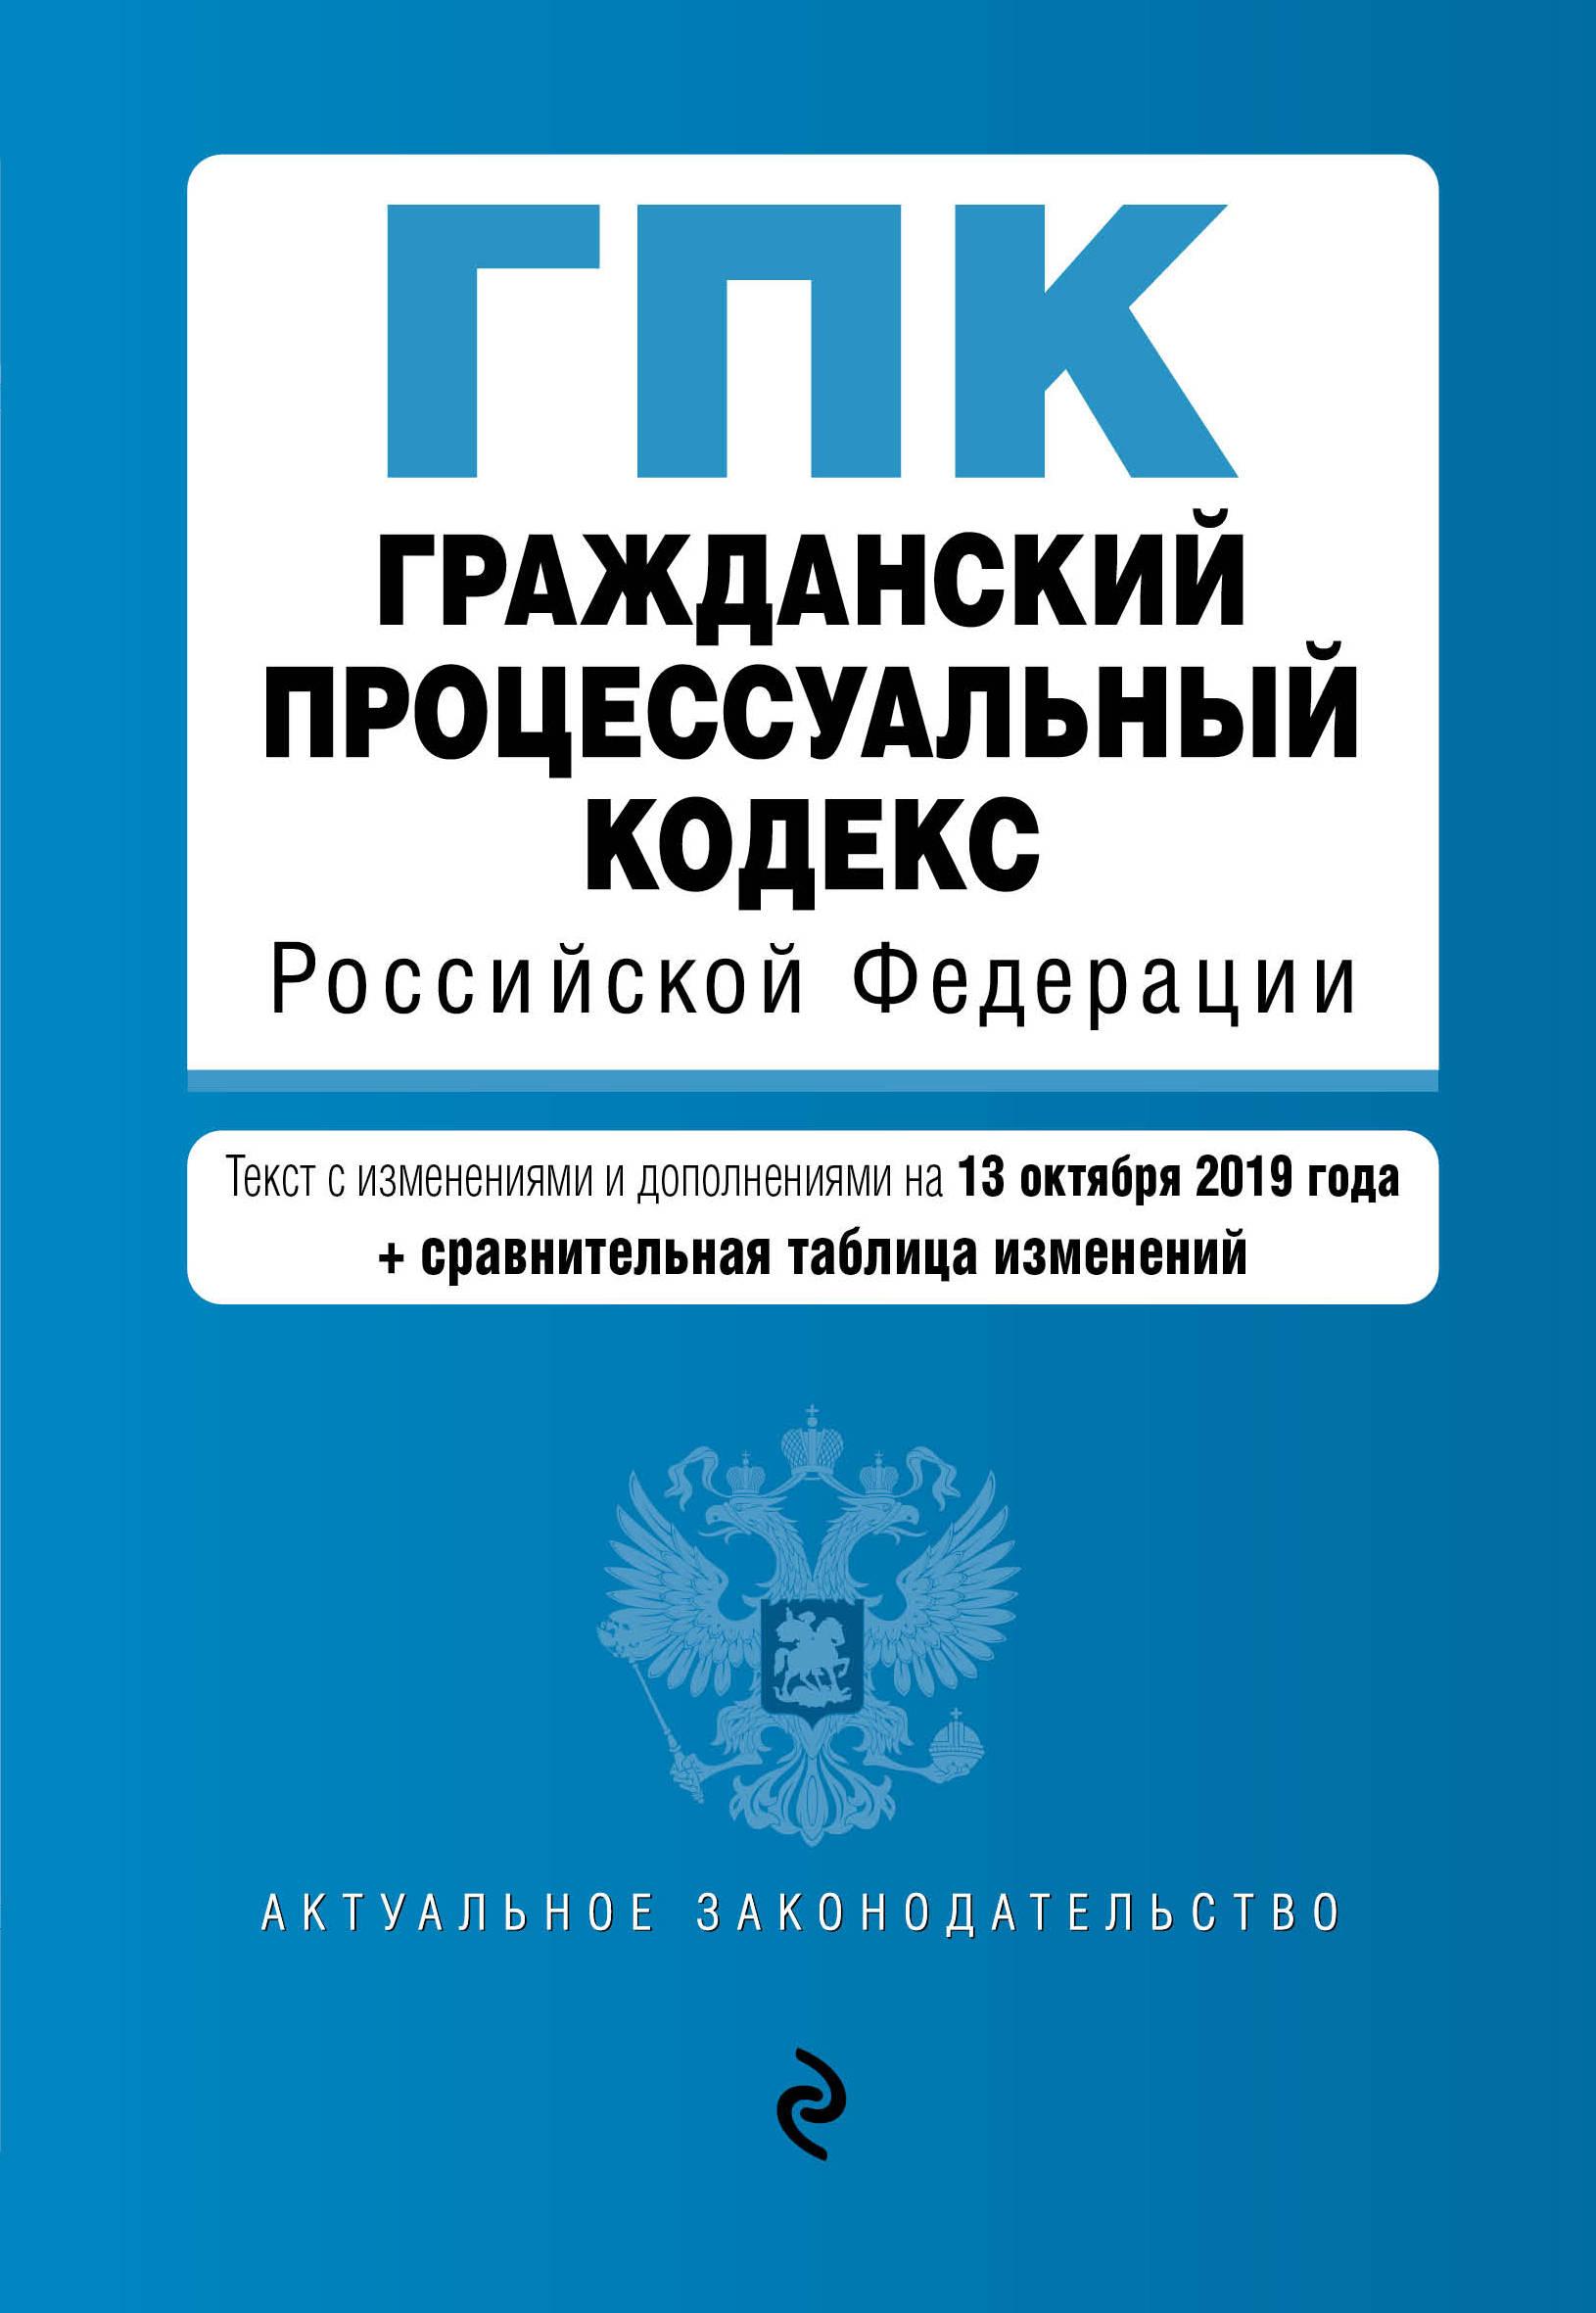 Grazhdanskij protsessualnyj kodeks Rossijskoj Federatsii. Tekst s izm. i dop. na 13 oktjabrja 2019 god (+ sravnitelnaja tablitsa izmenenij)